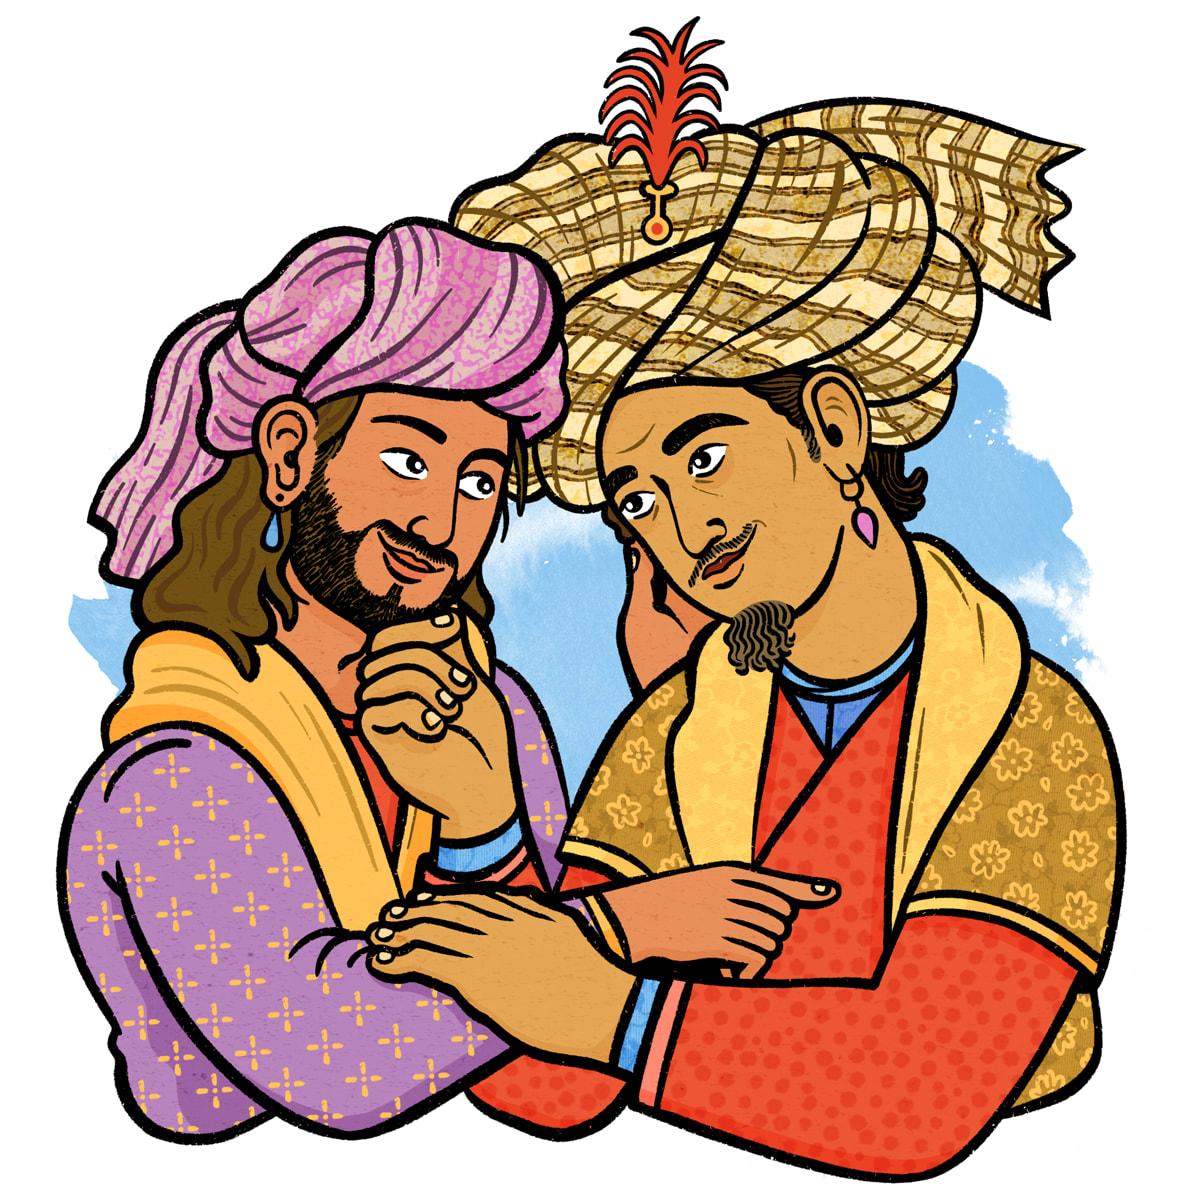 Two persian men embracing, wearing historic fashion